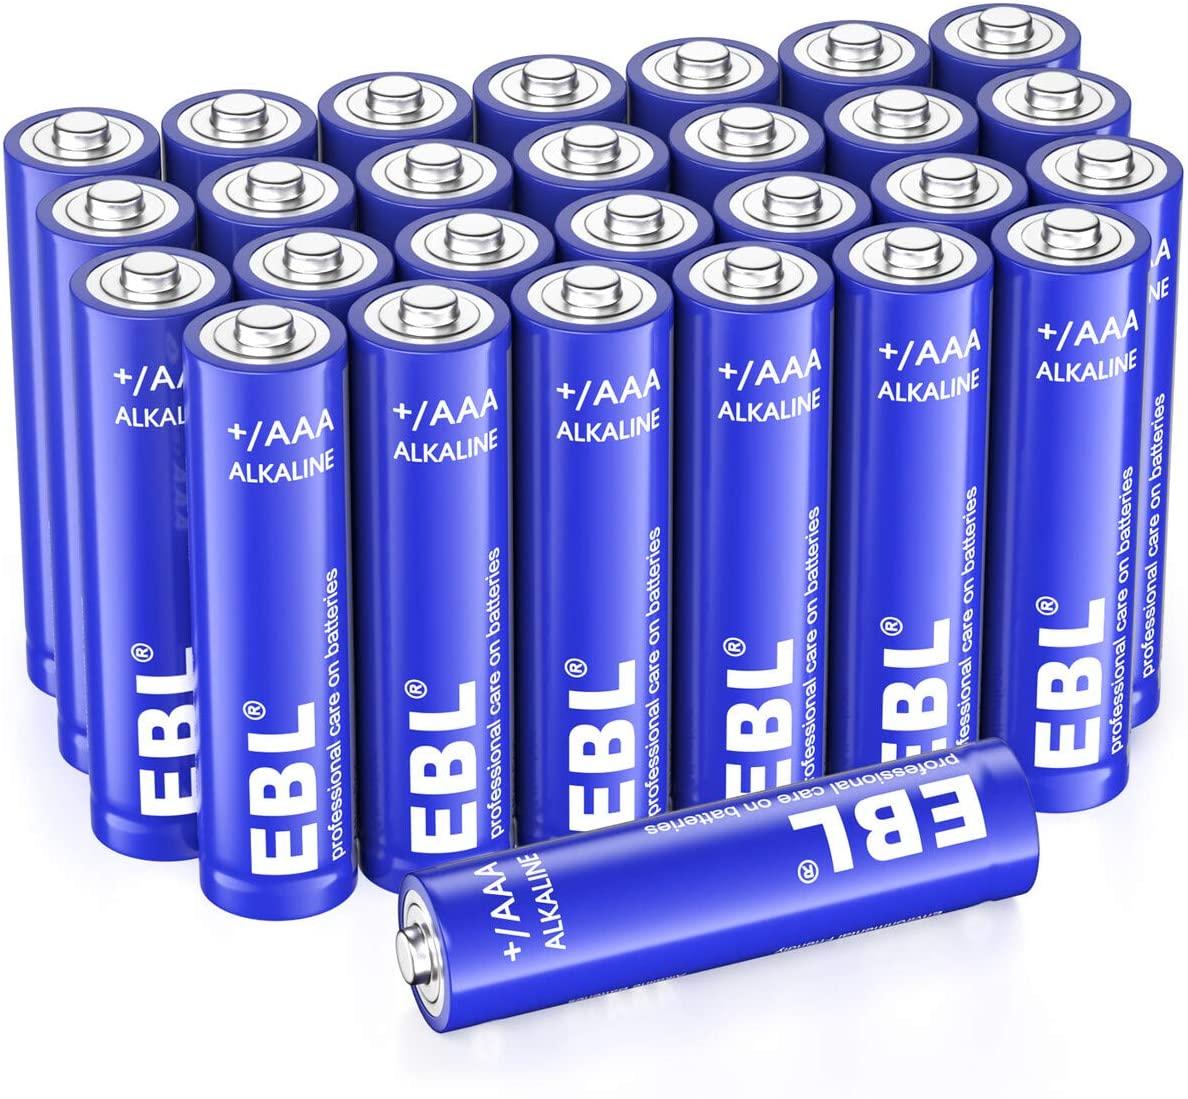 EBL AAA Alkaline Batteries - Triple A 1.5V Long Lasting AAA Batteries Single Use Battery (28 Count)